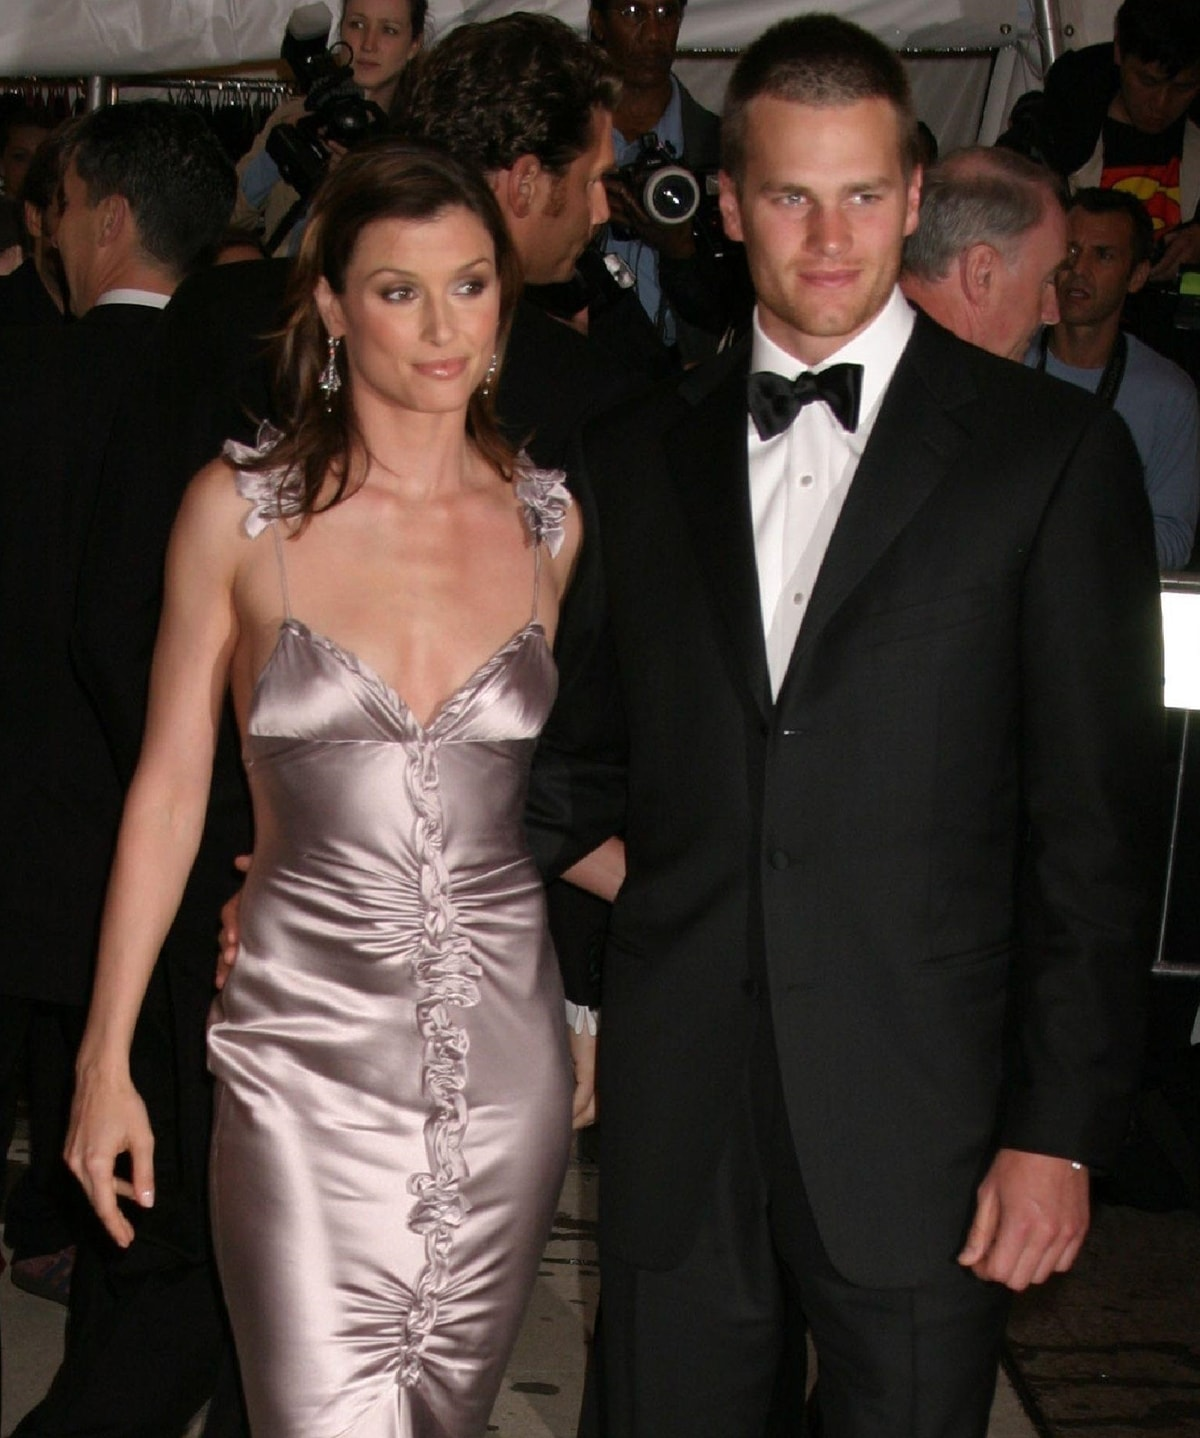 Bridget Moynahan and Tom Brady are the parents of John Edward Thomas (Jack) Moynahan